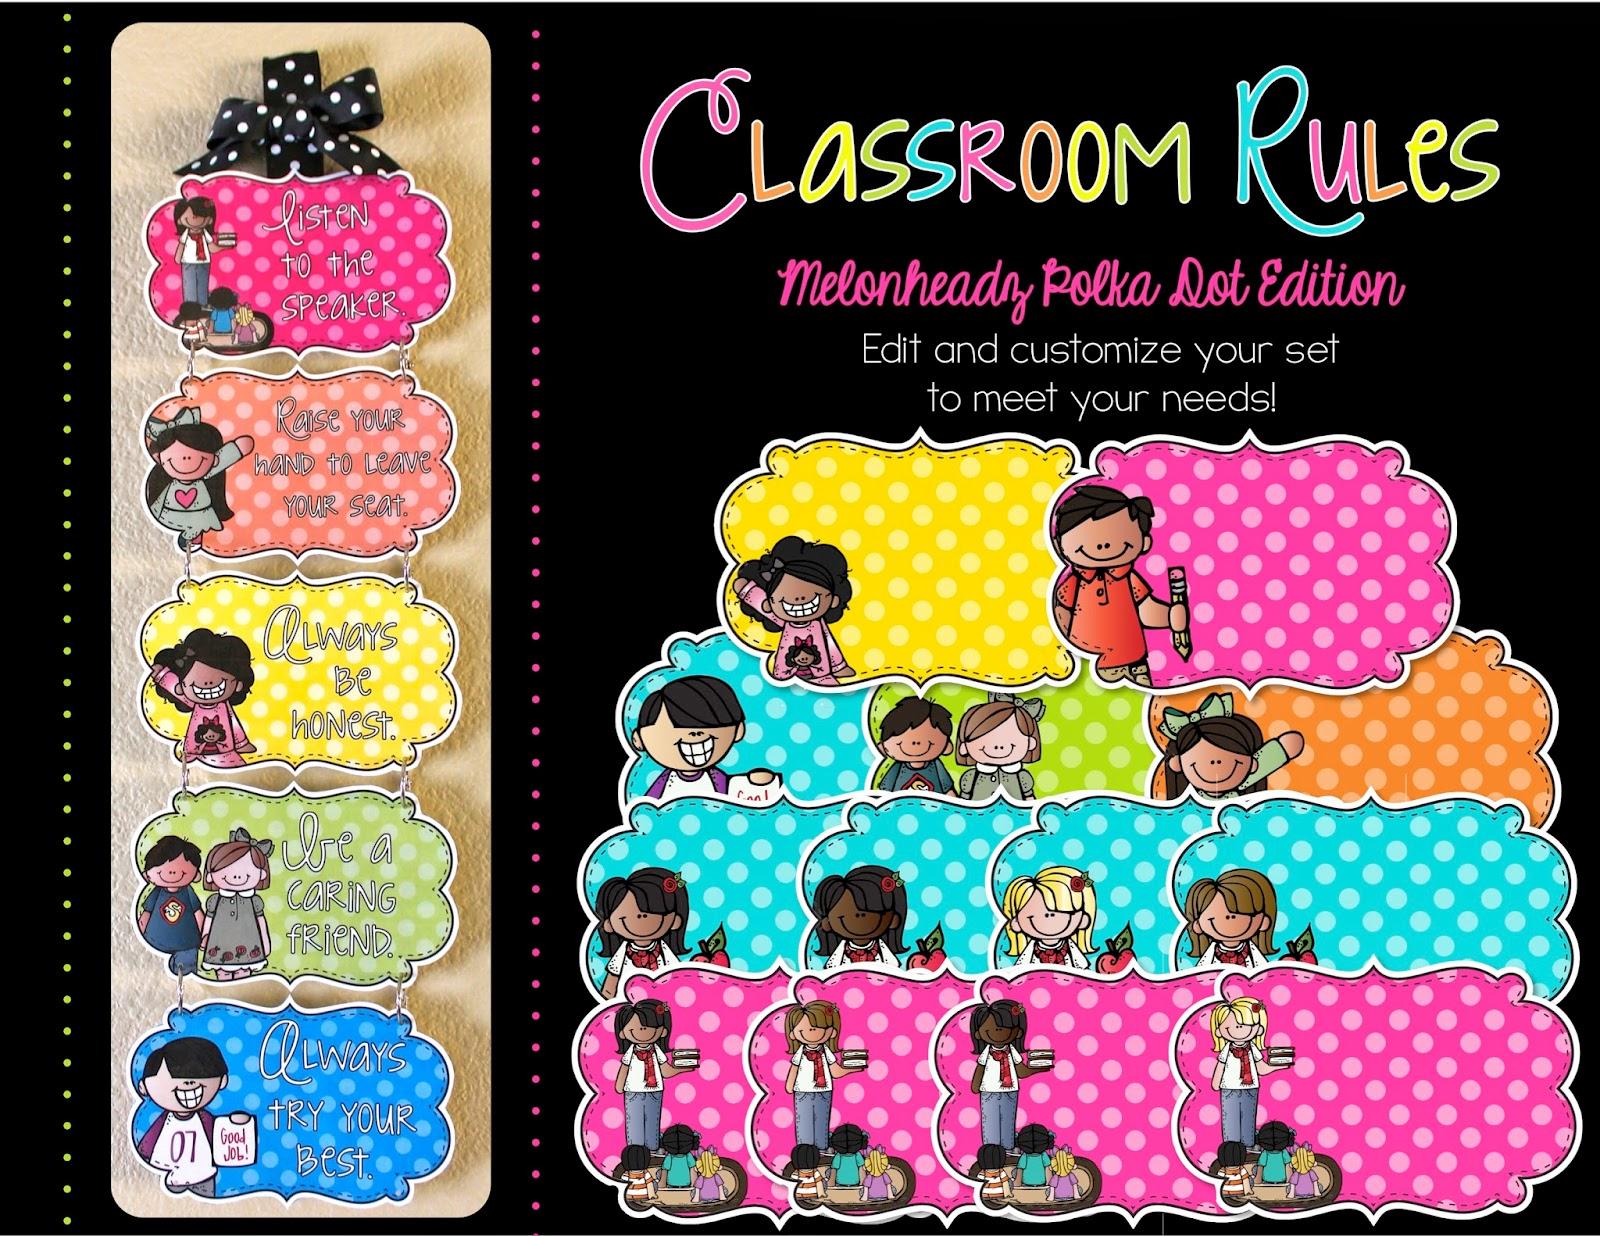 http://www.teacherspayteachers.com/Product/Editable-Classroom-Rules-Melonheadz-Polka-Dot-Edition-1336253